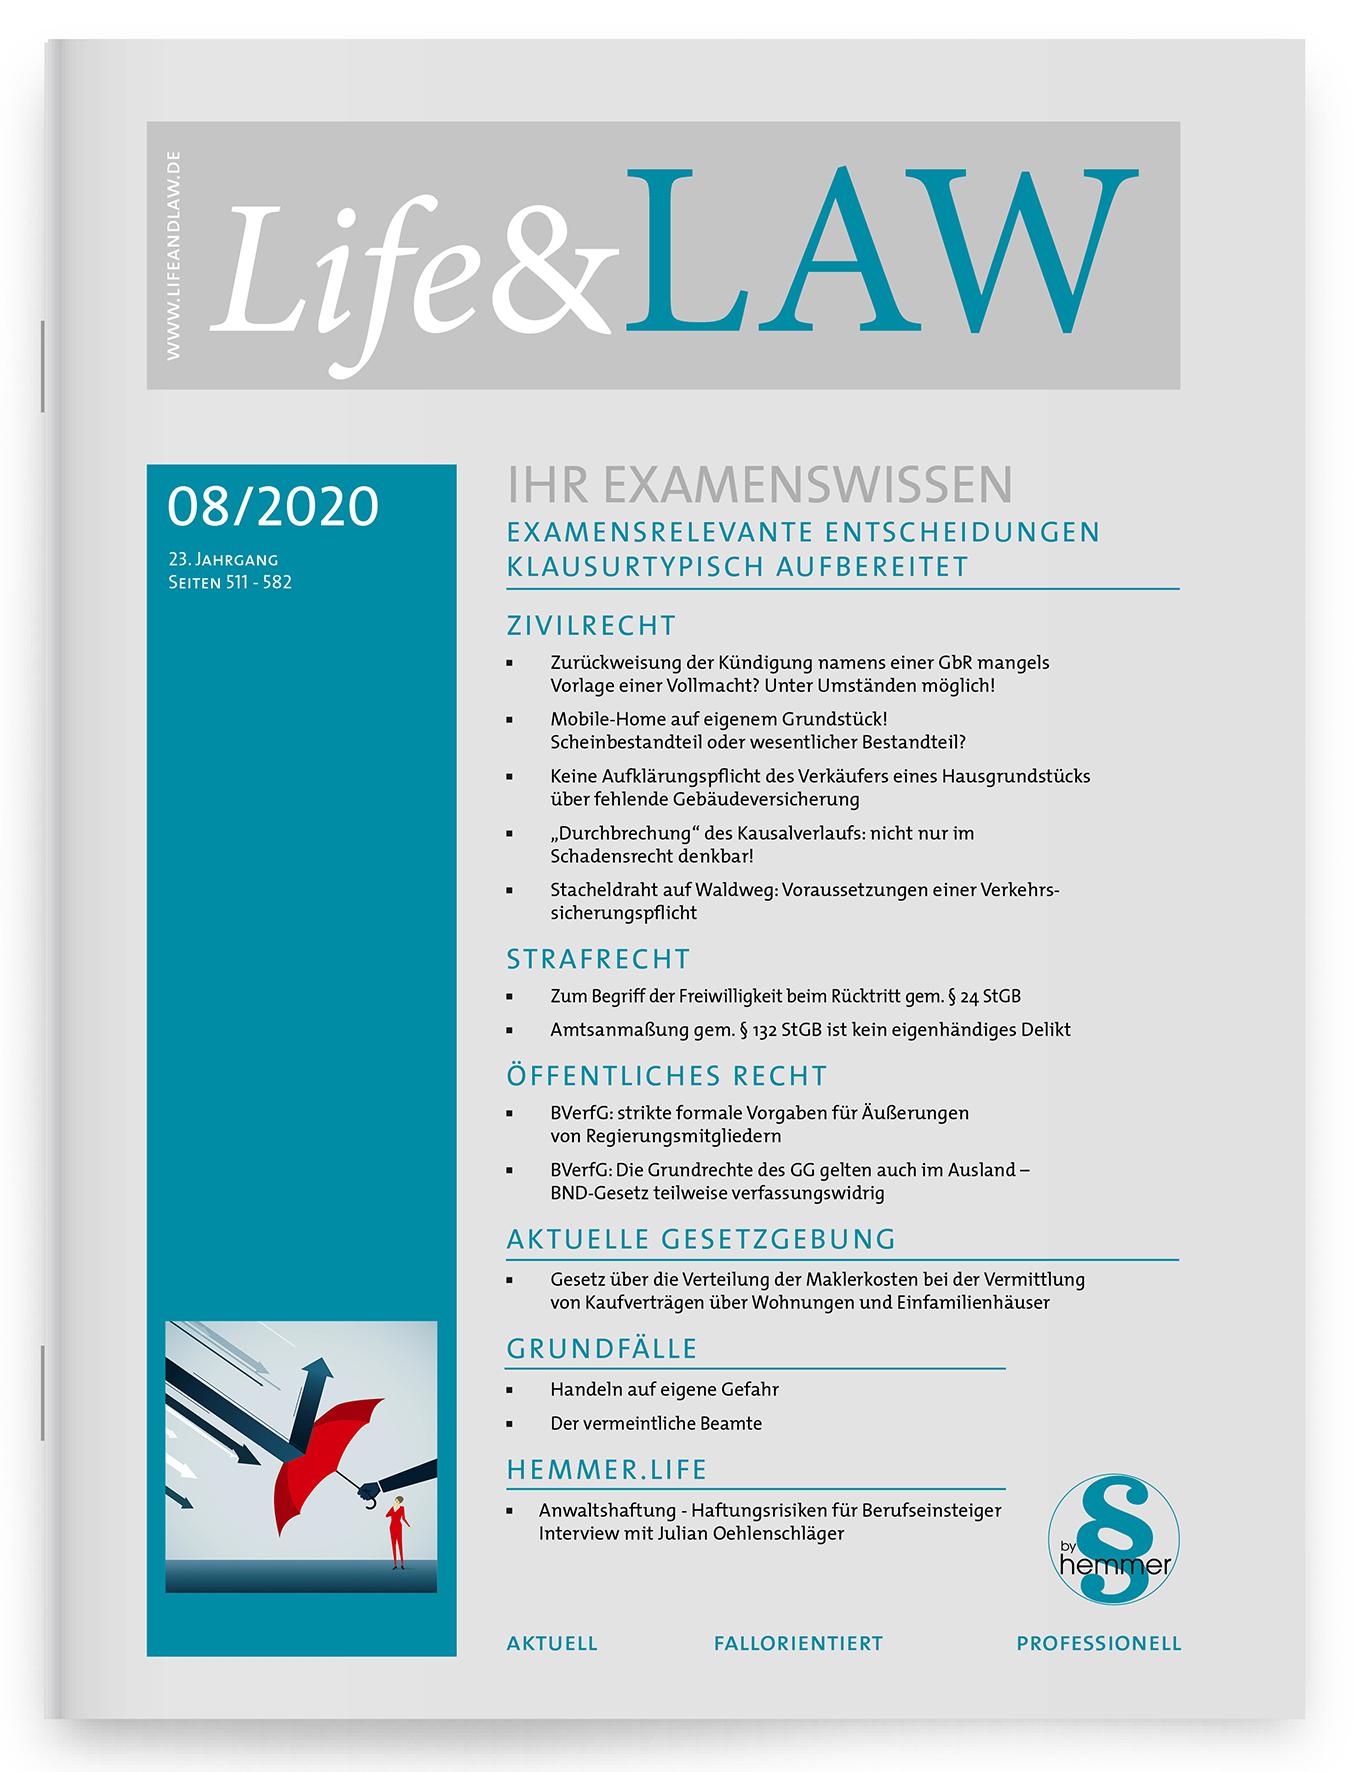 Life&LAW Ausgabe 2020/08